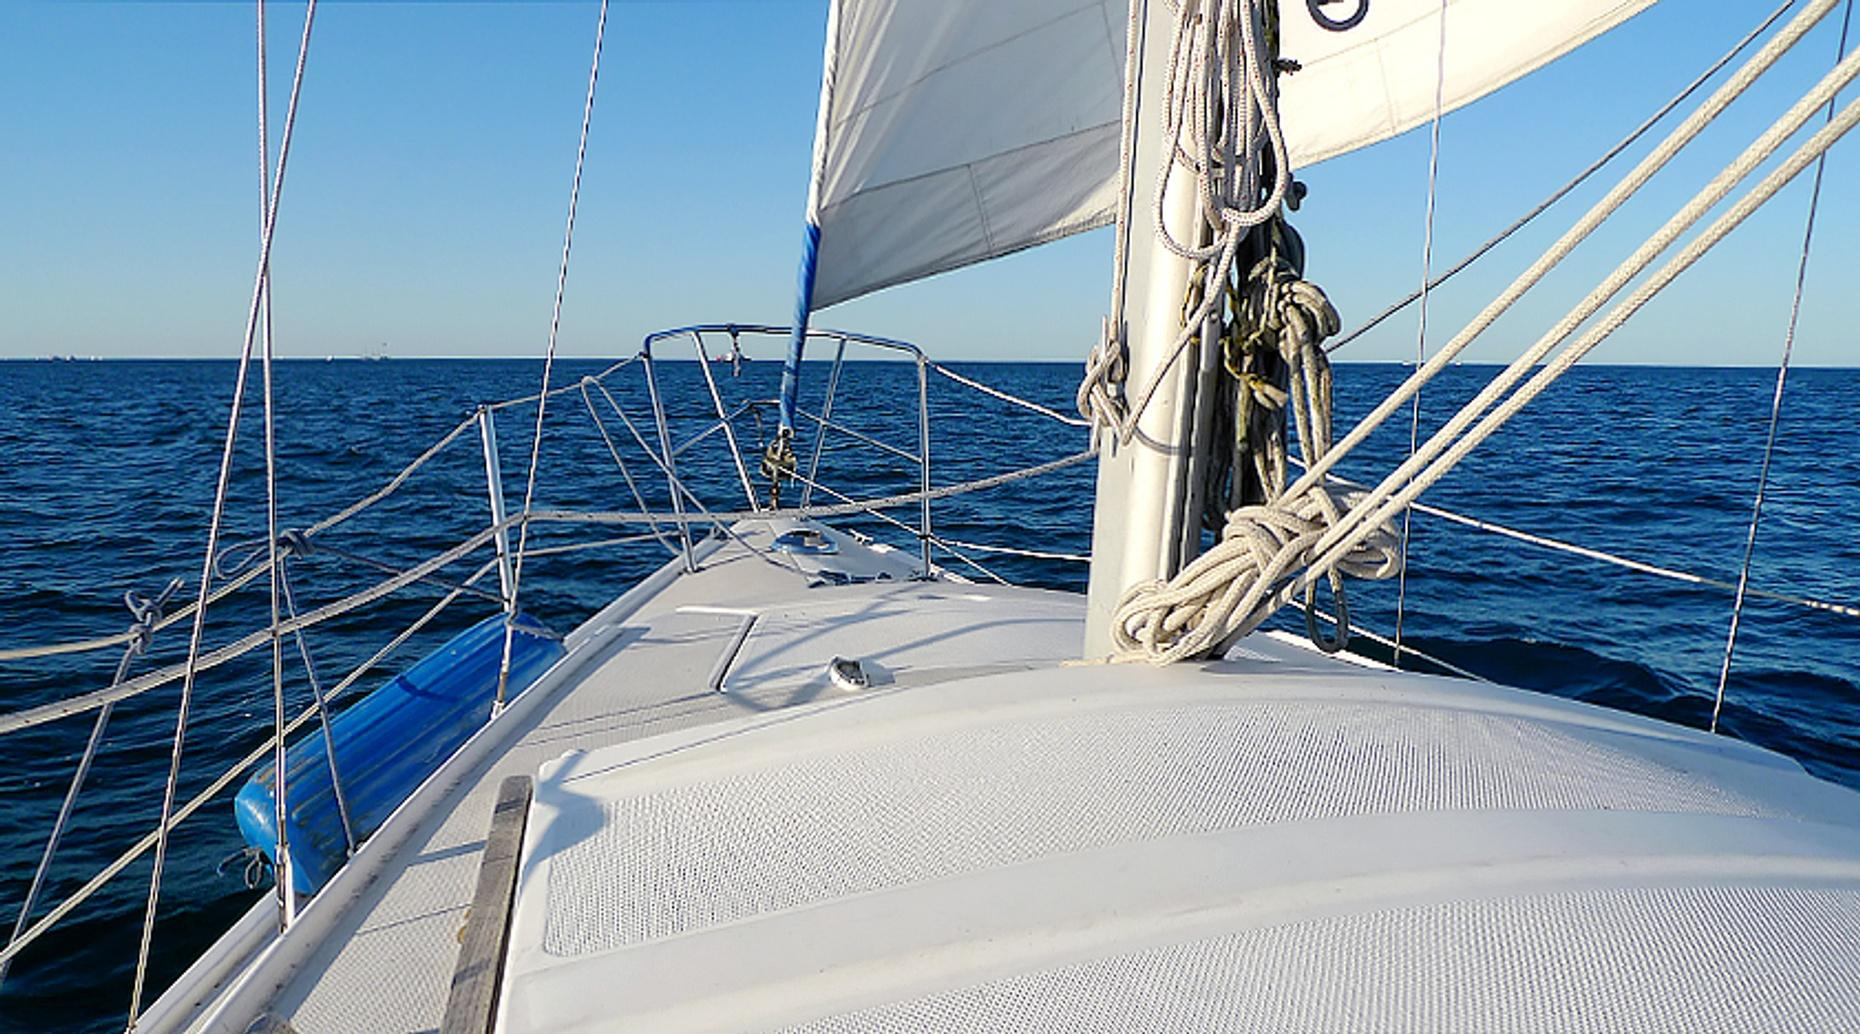 ASA 101 Basic Keelboat Course in Boston